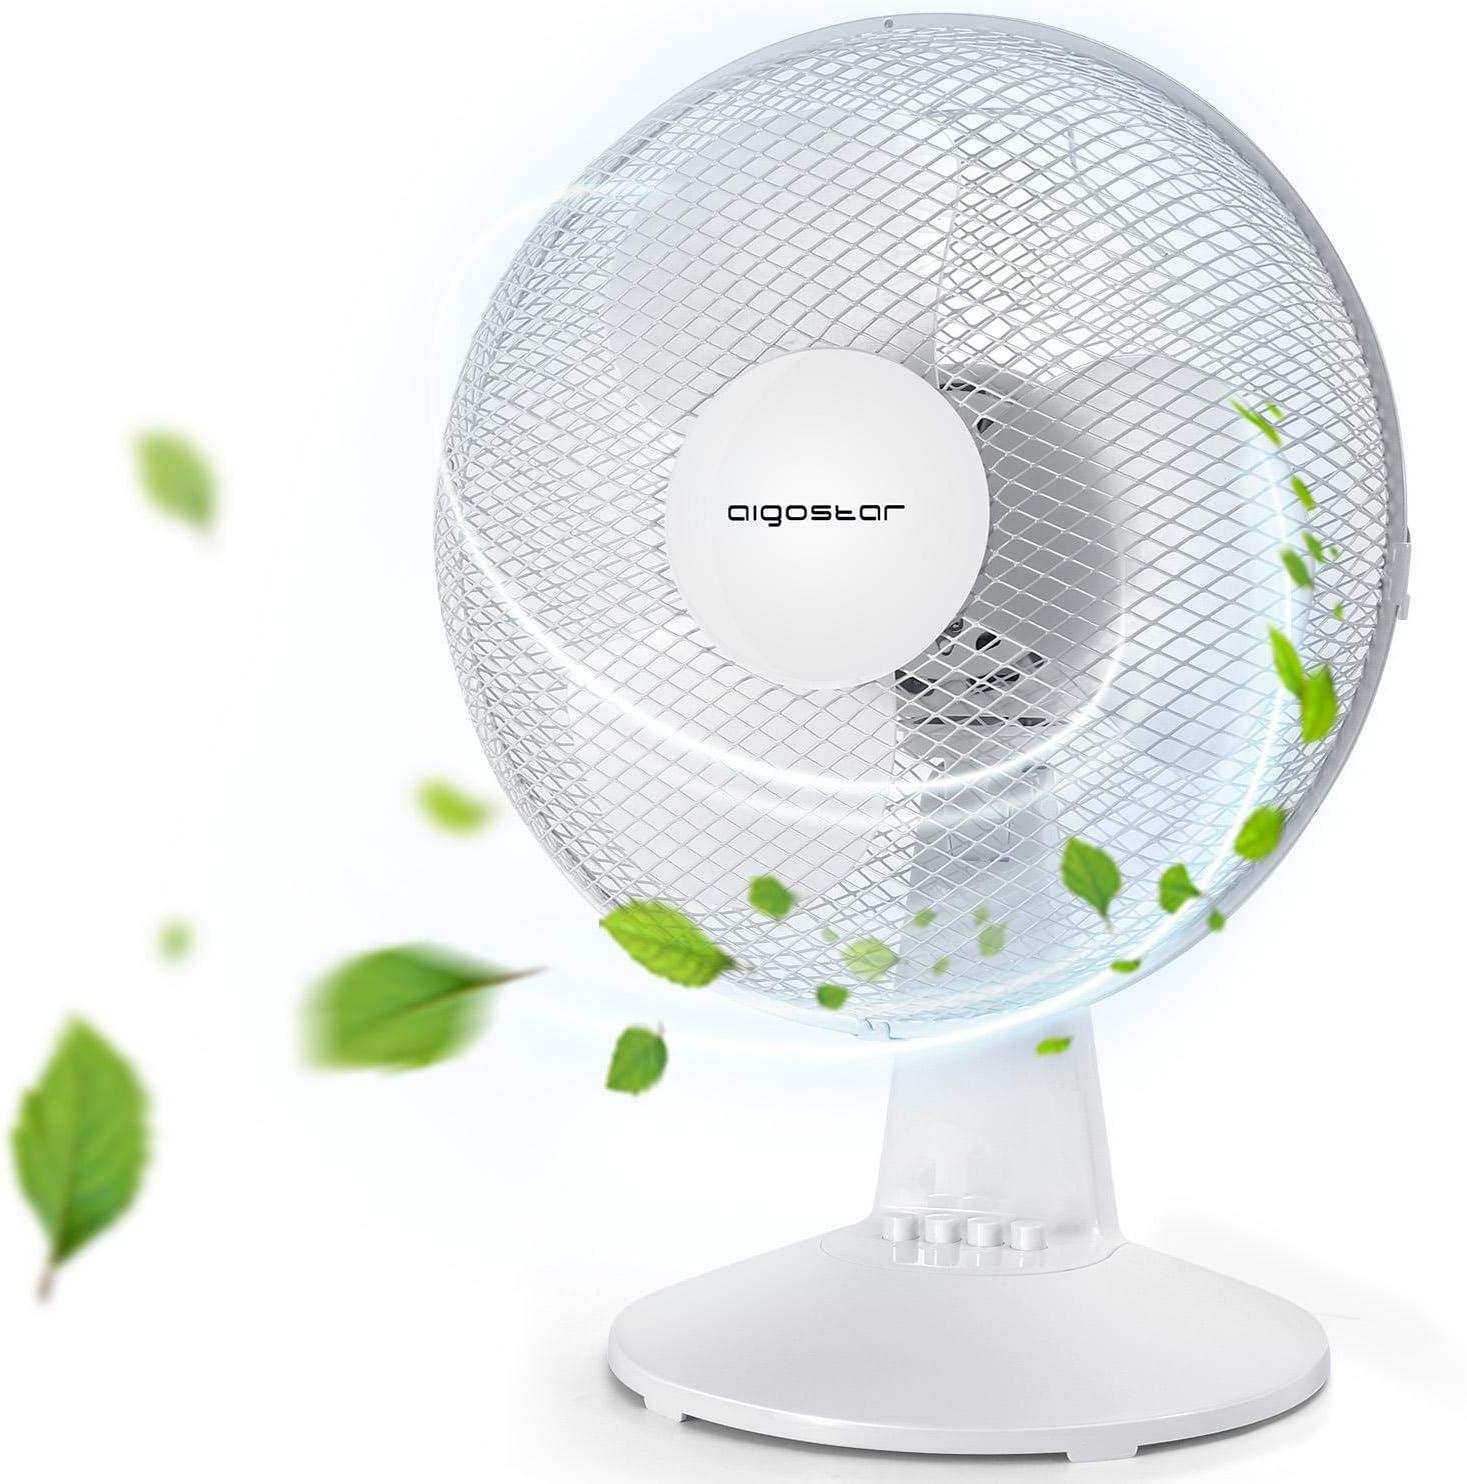 Aigostar Allace 33JTO - Ventilador de mesa con 3 velocidades, Ventilador sobremesa 43,5cm, oscilación silencioso de 80 grados, potencia 40 W, color blanco. Diseño exclusivo.